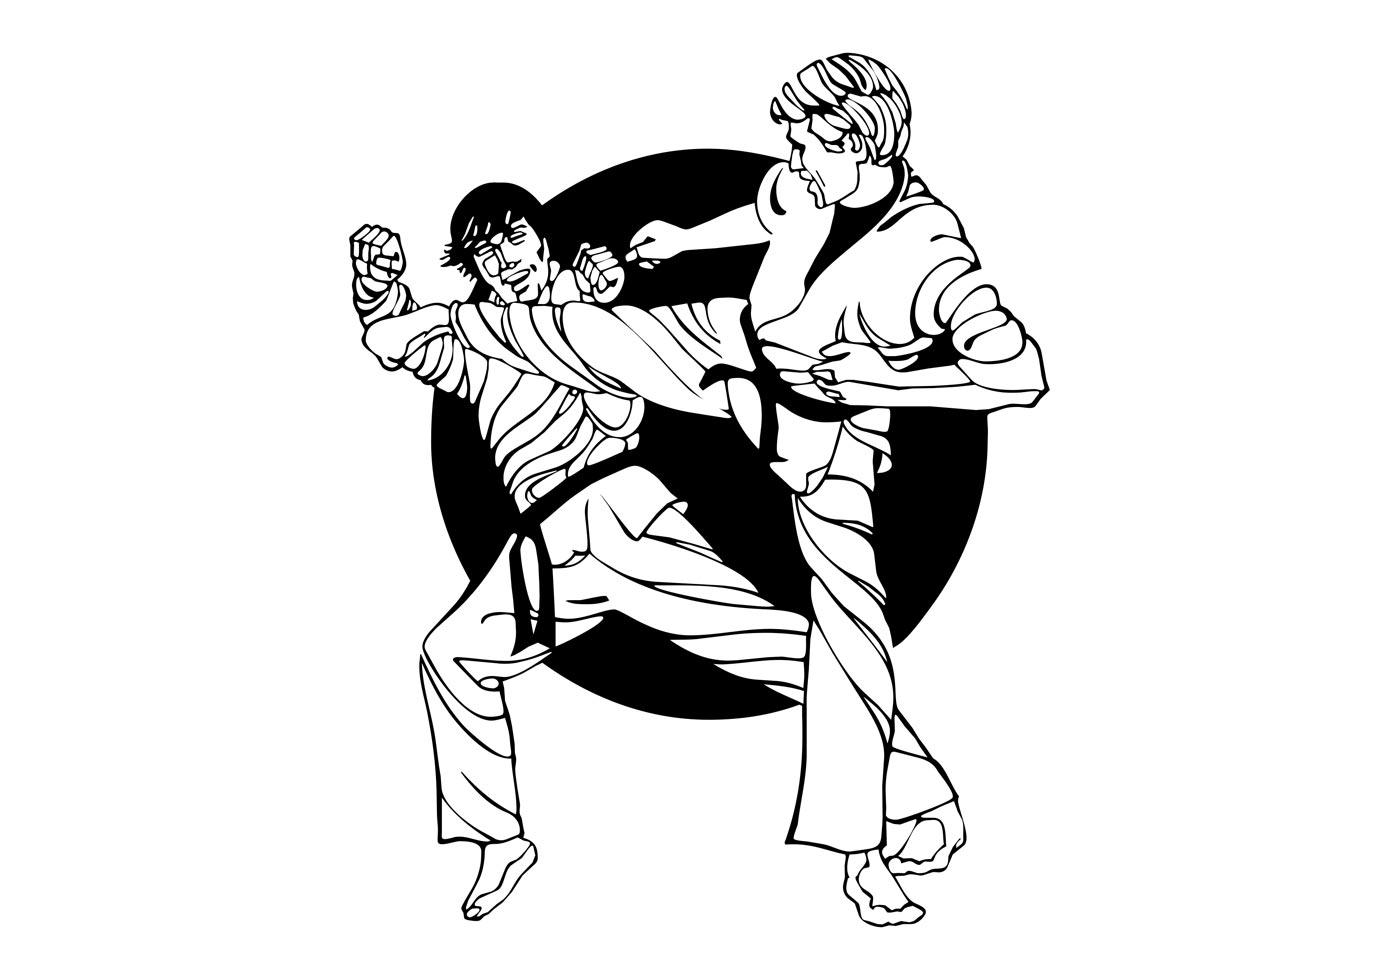 Karate Fight Graphics - Download Free Vector Art, Stock ...